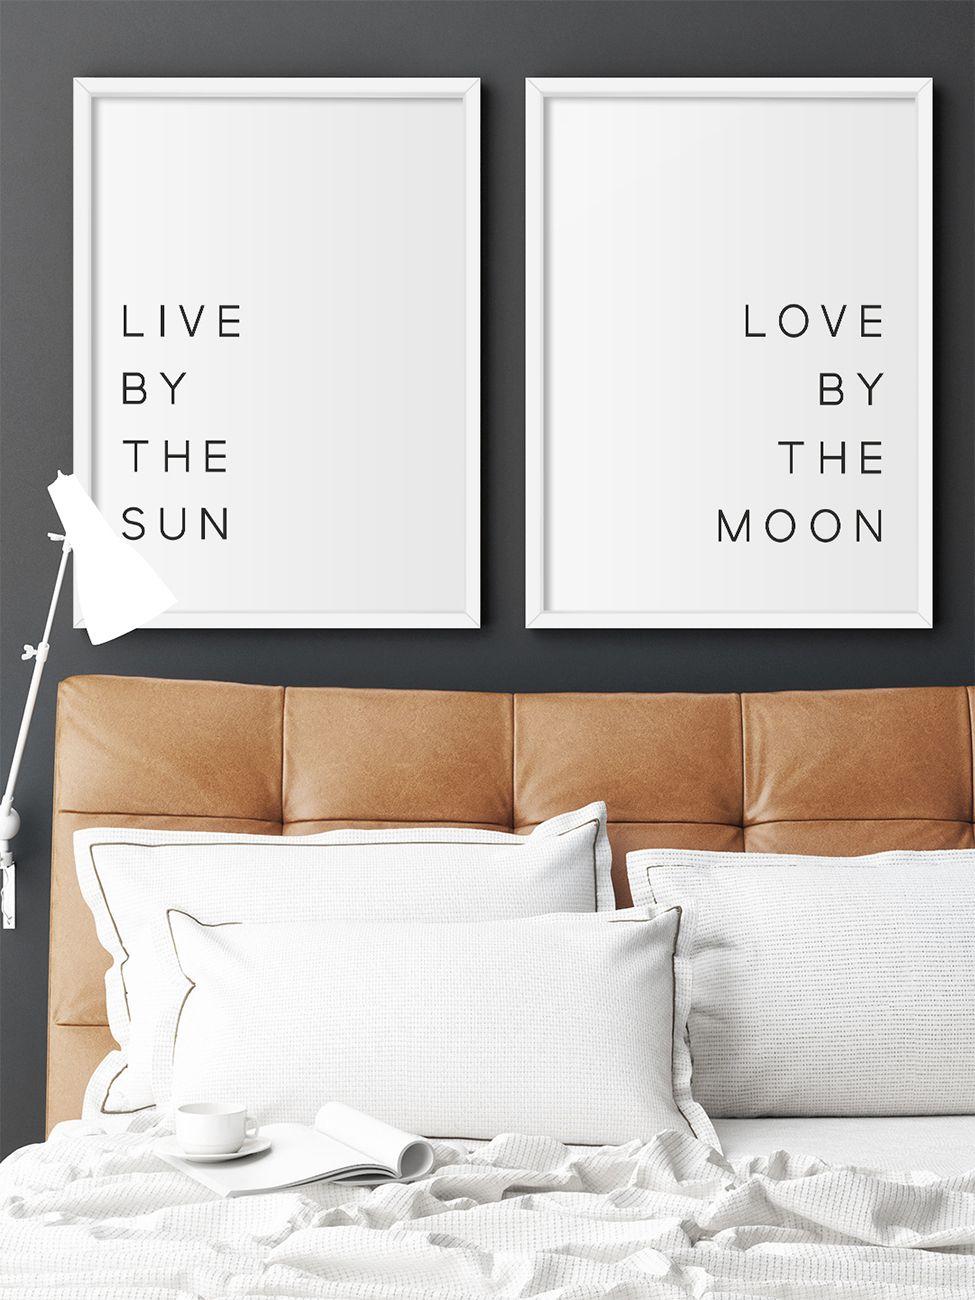 KIT DE QUADROS LIVE BY THE SUN / LOVE BY THE MOON decorativos